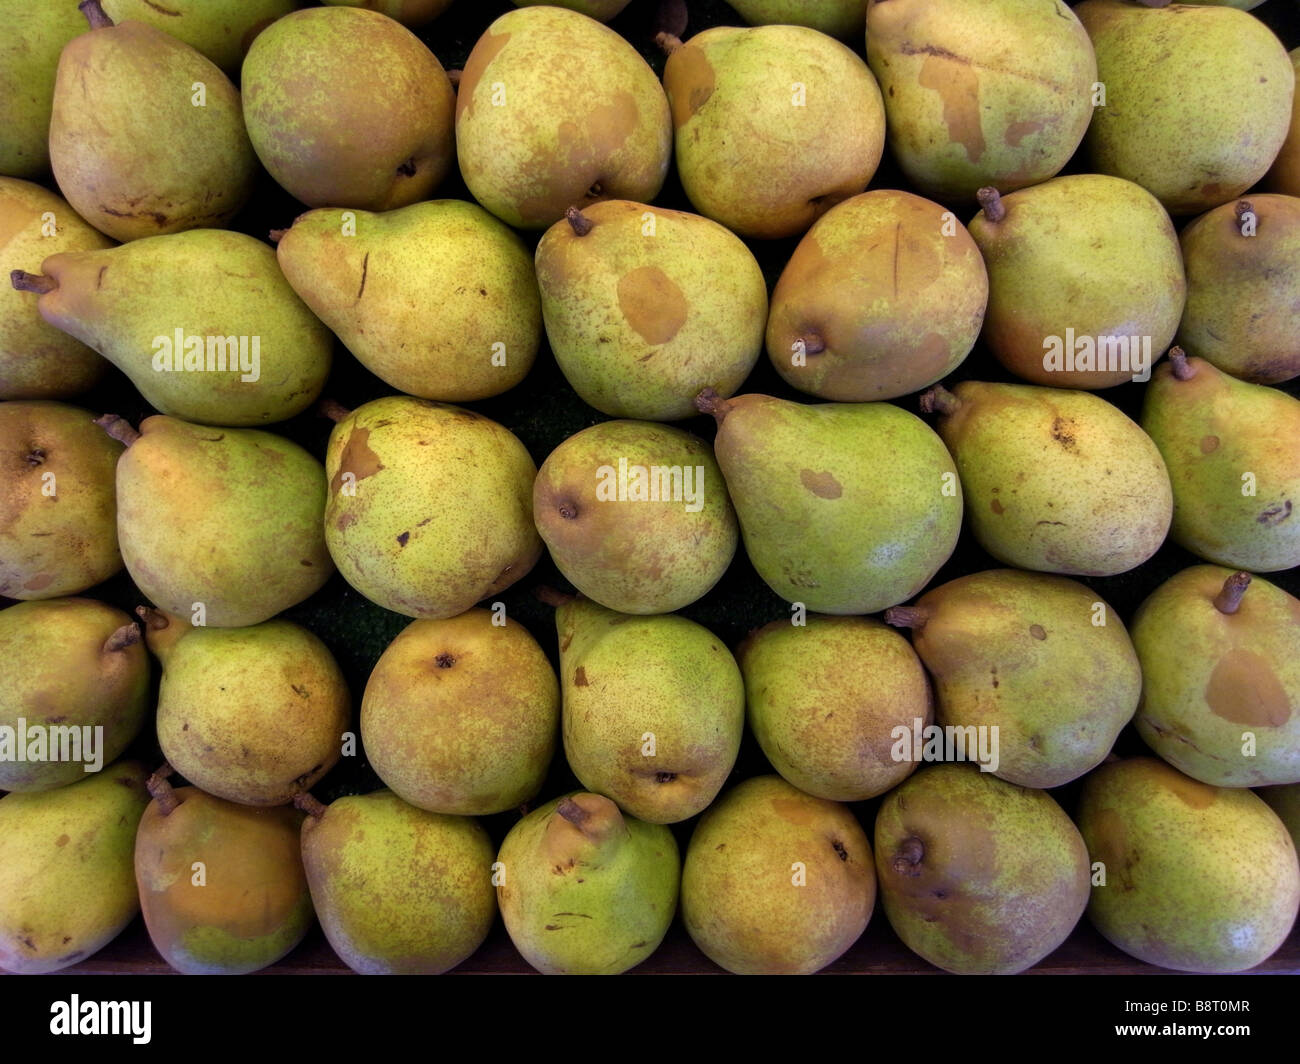 pears on display - Stock Image